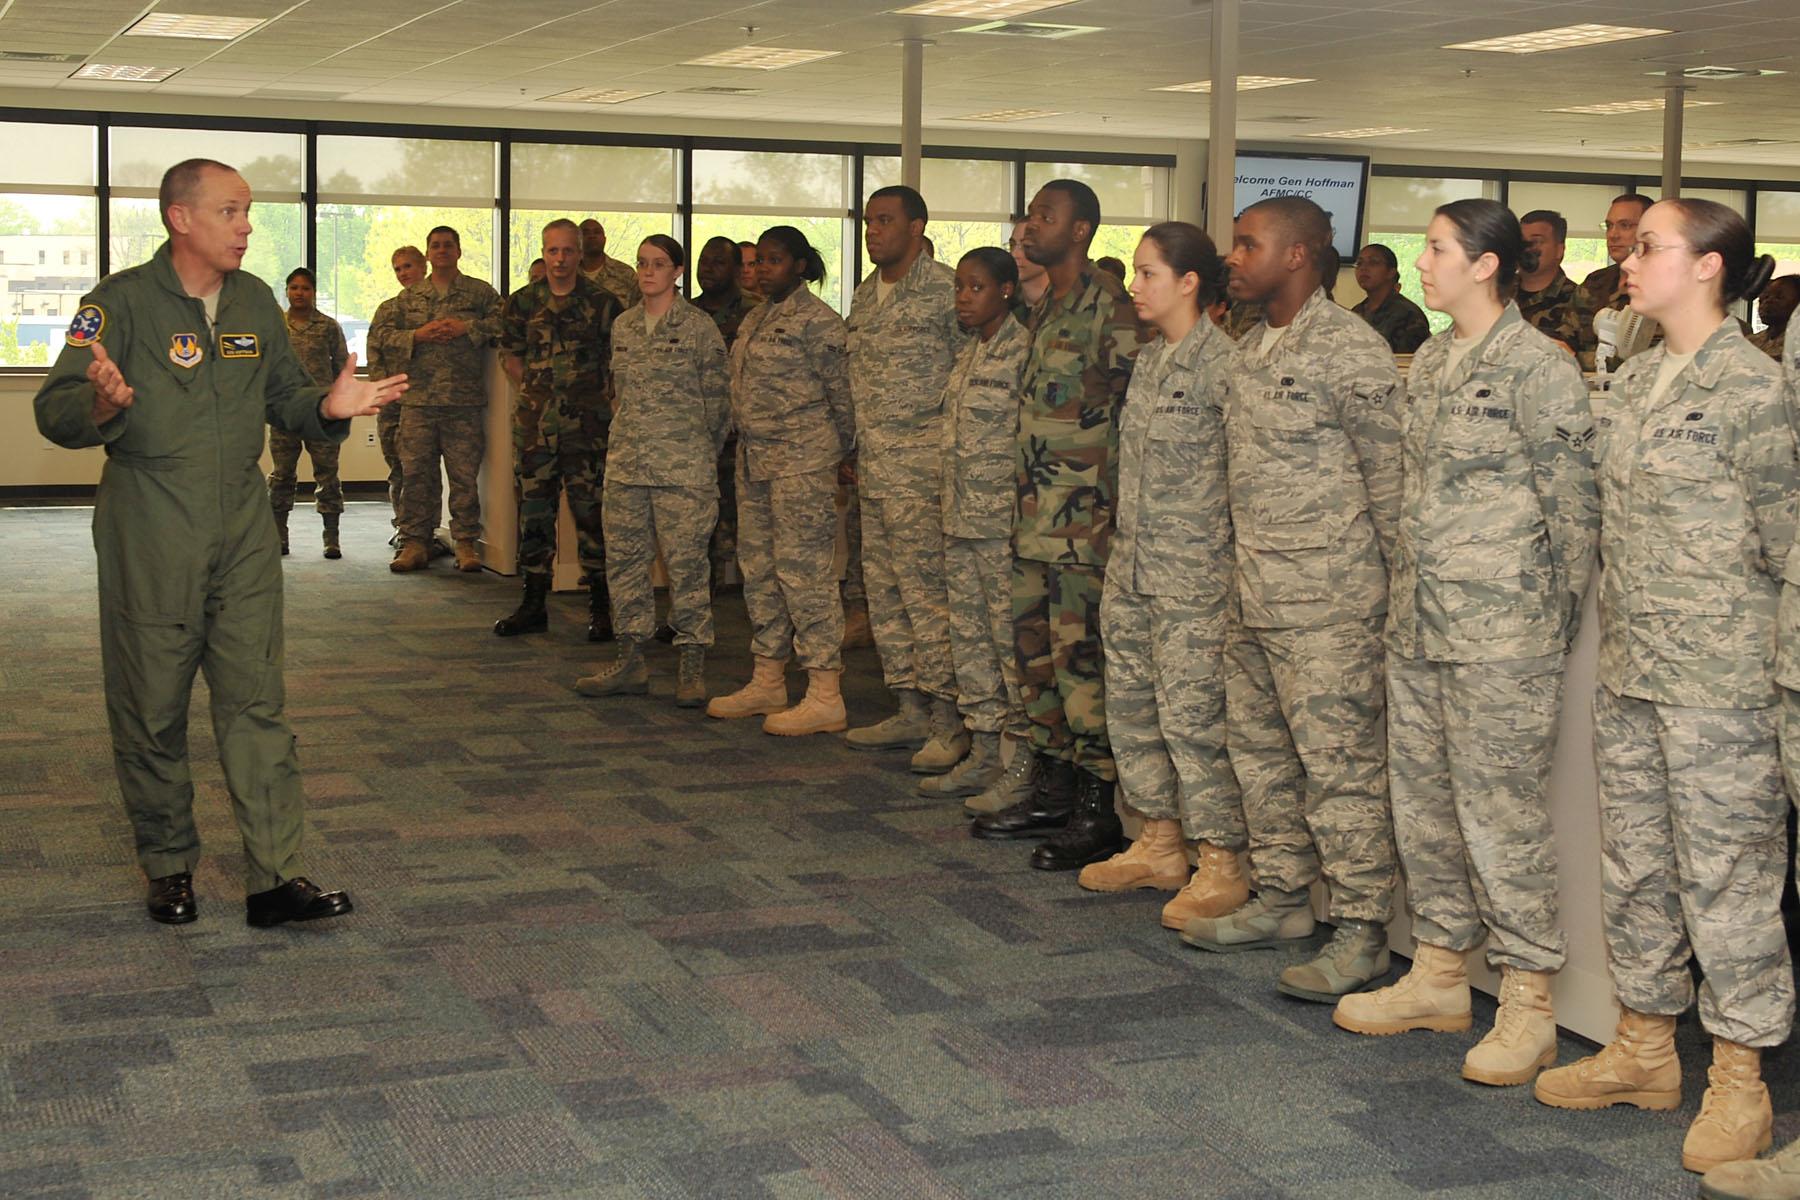 AFMC Commander Visits 635th SCMG